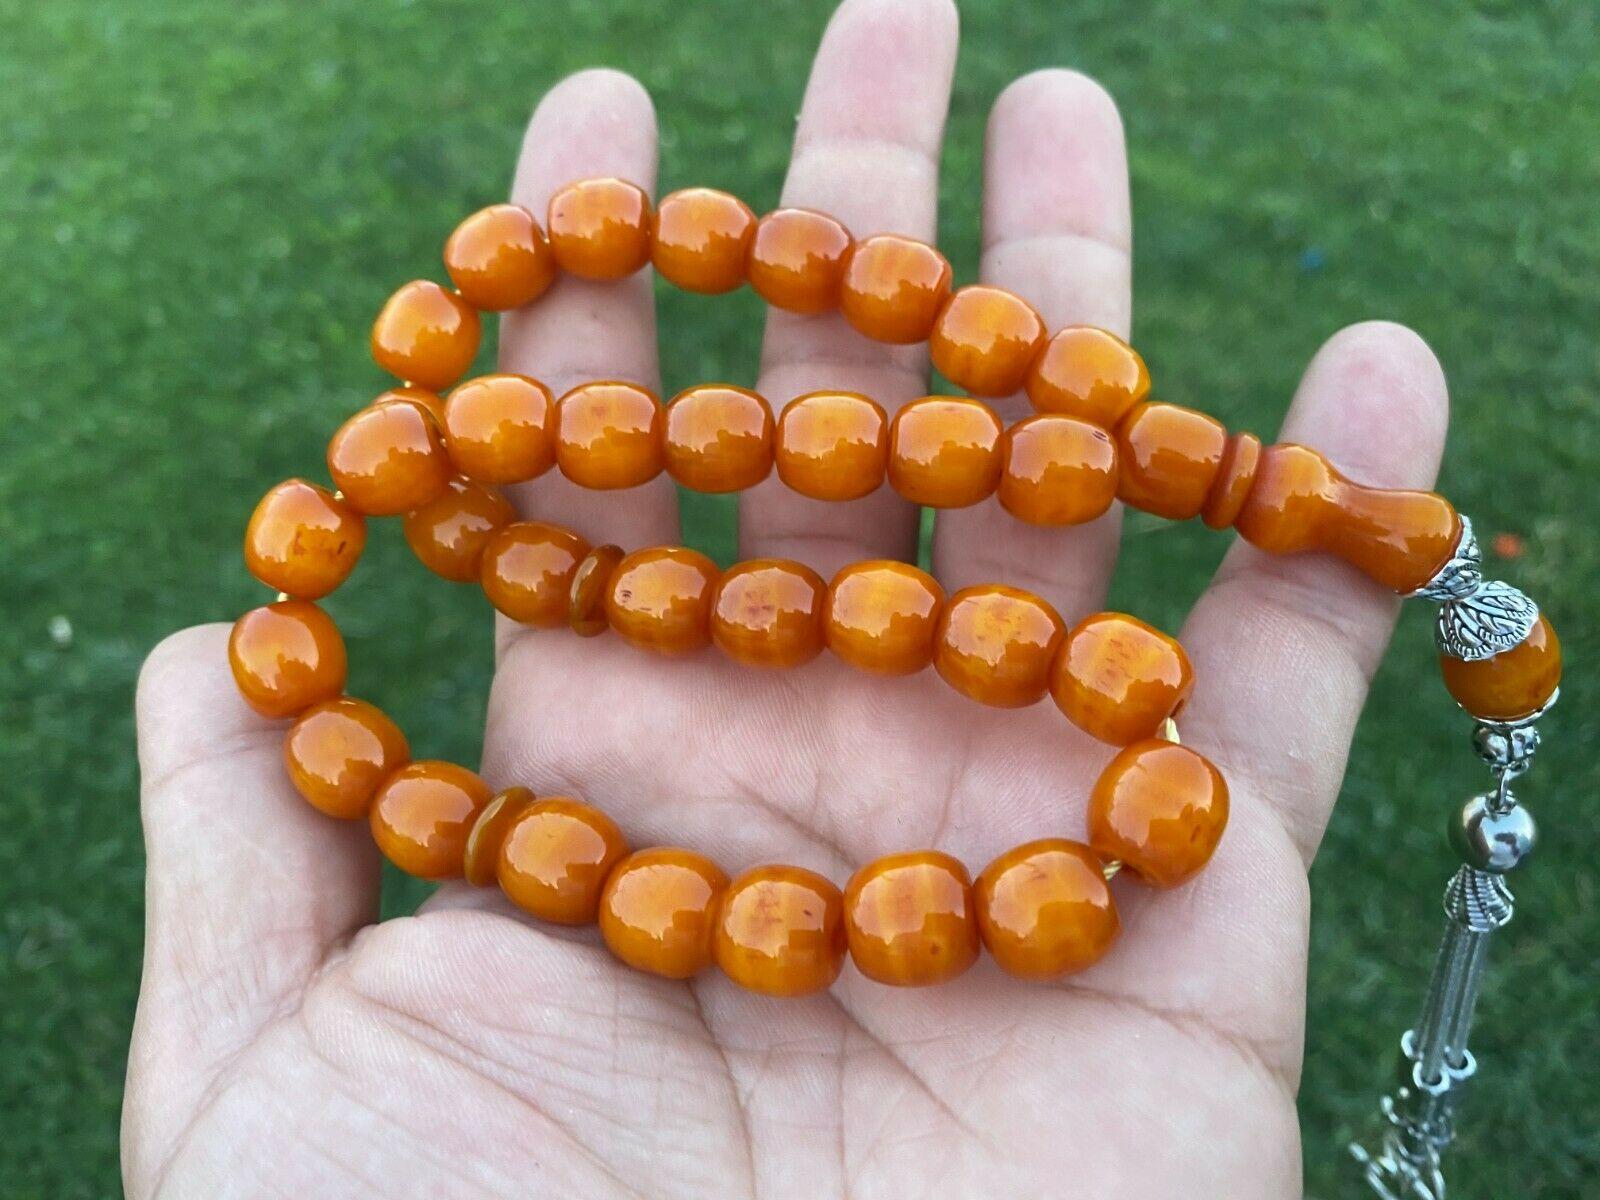 Ottoman Faturan German Amber Sandalous Misbaha Prayer Beads Islamic Gift Tasbih Tasbeeh Tasbeh Rosary Tasbih